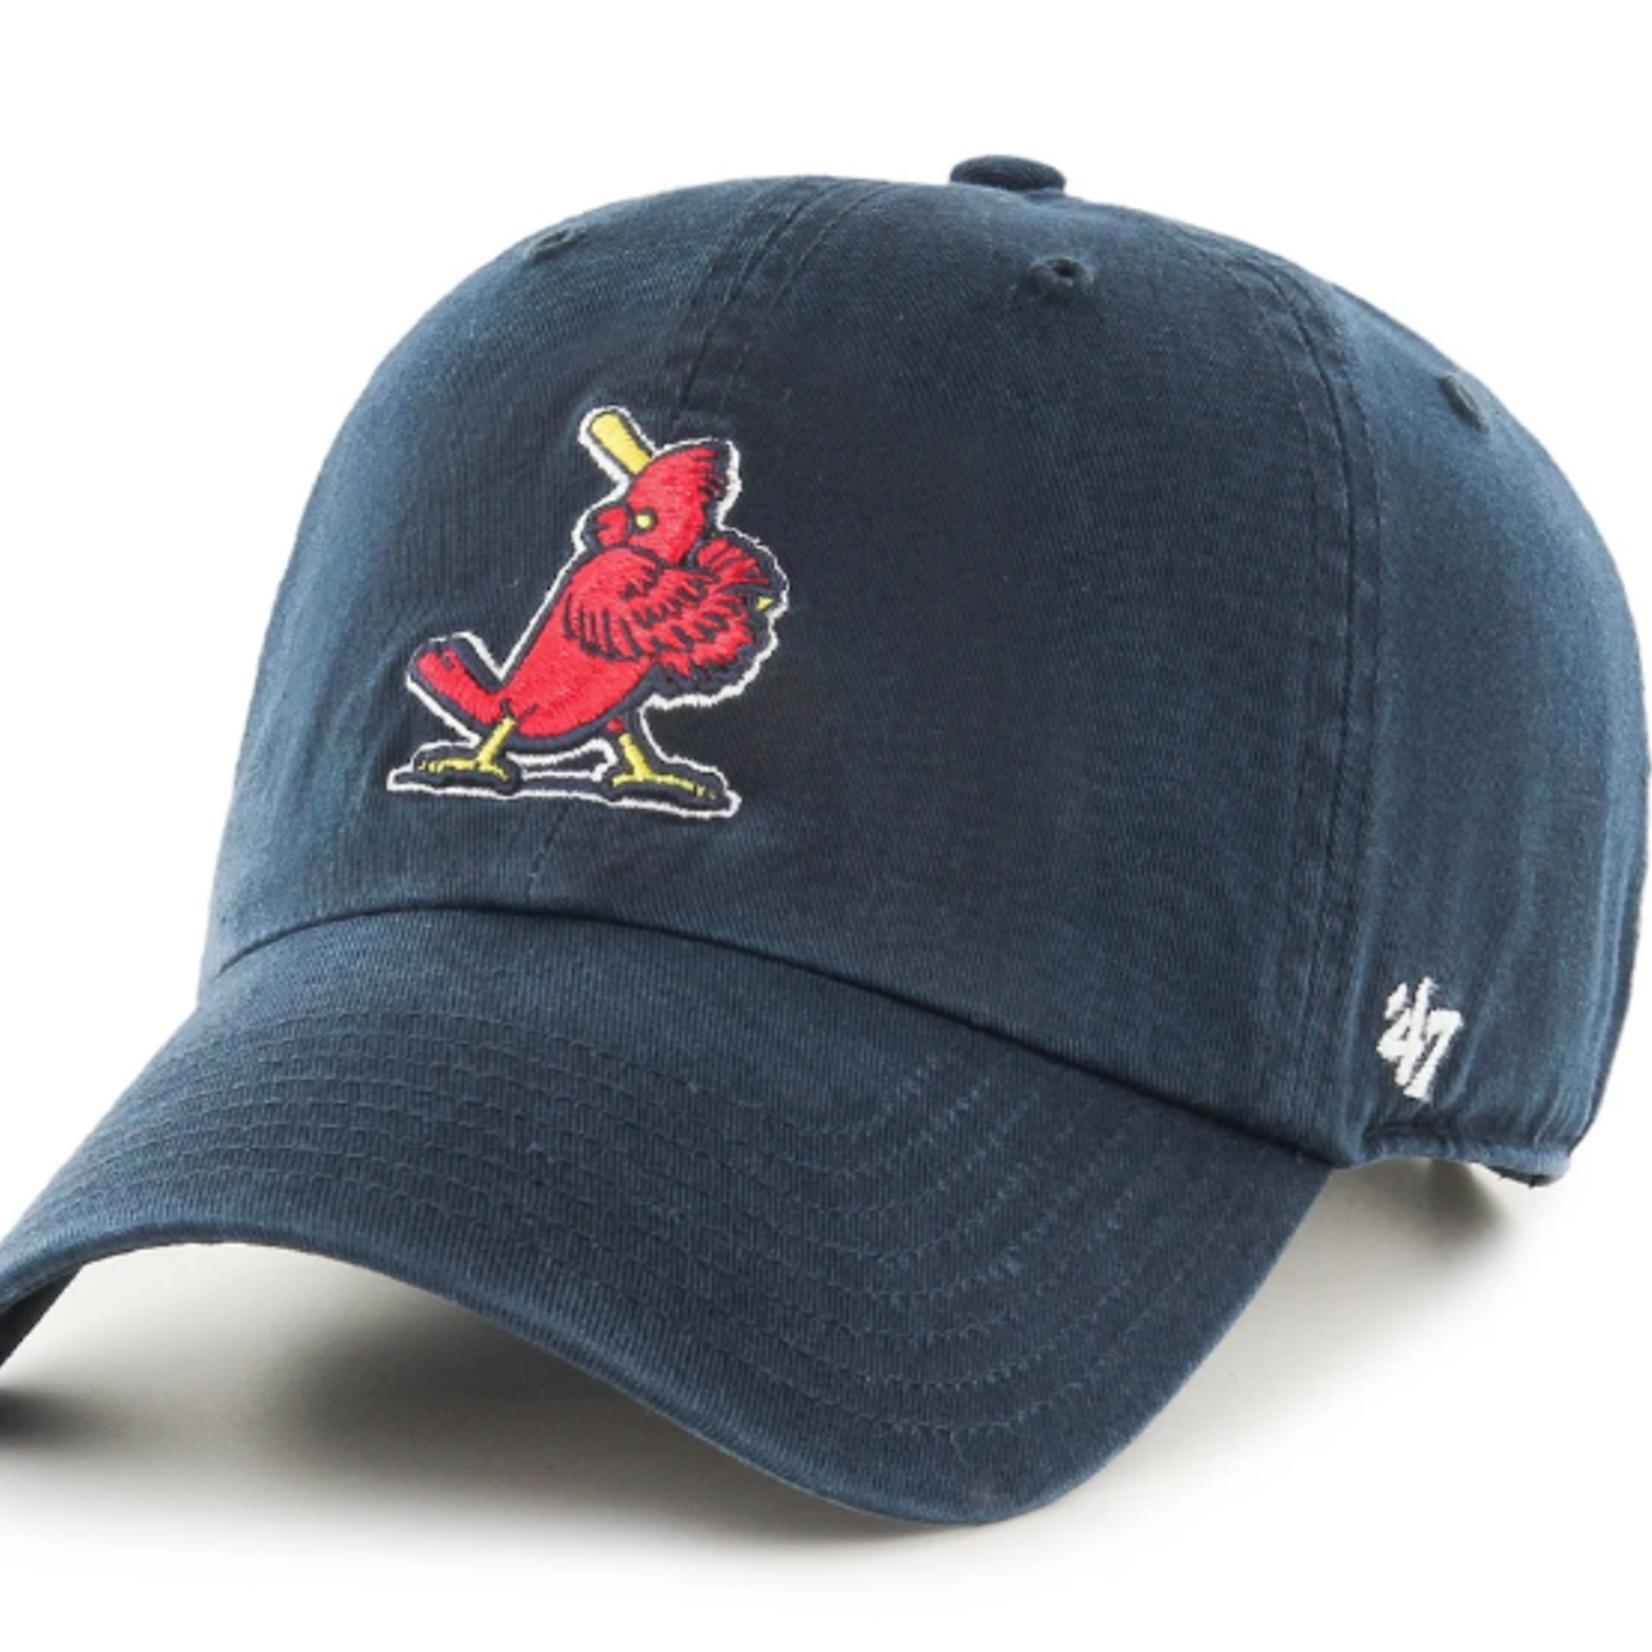 47 Brand 47 Brand St. Louis Cardinals Cooperstown '47 Clean Up Cap